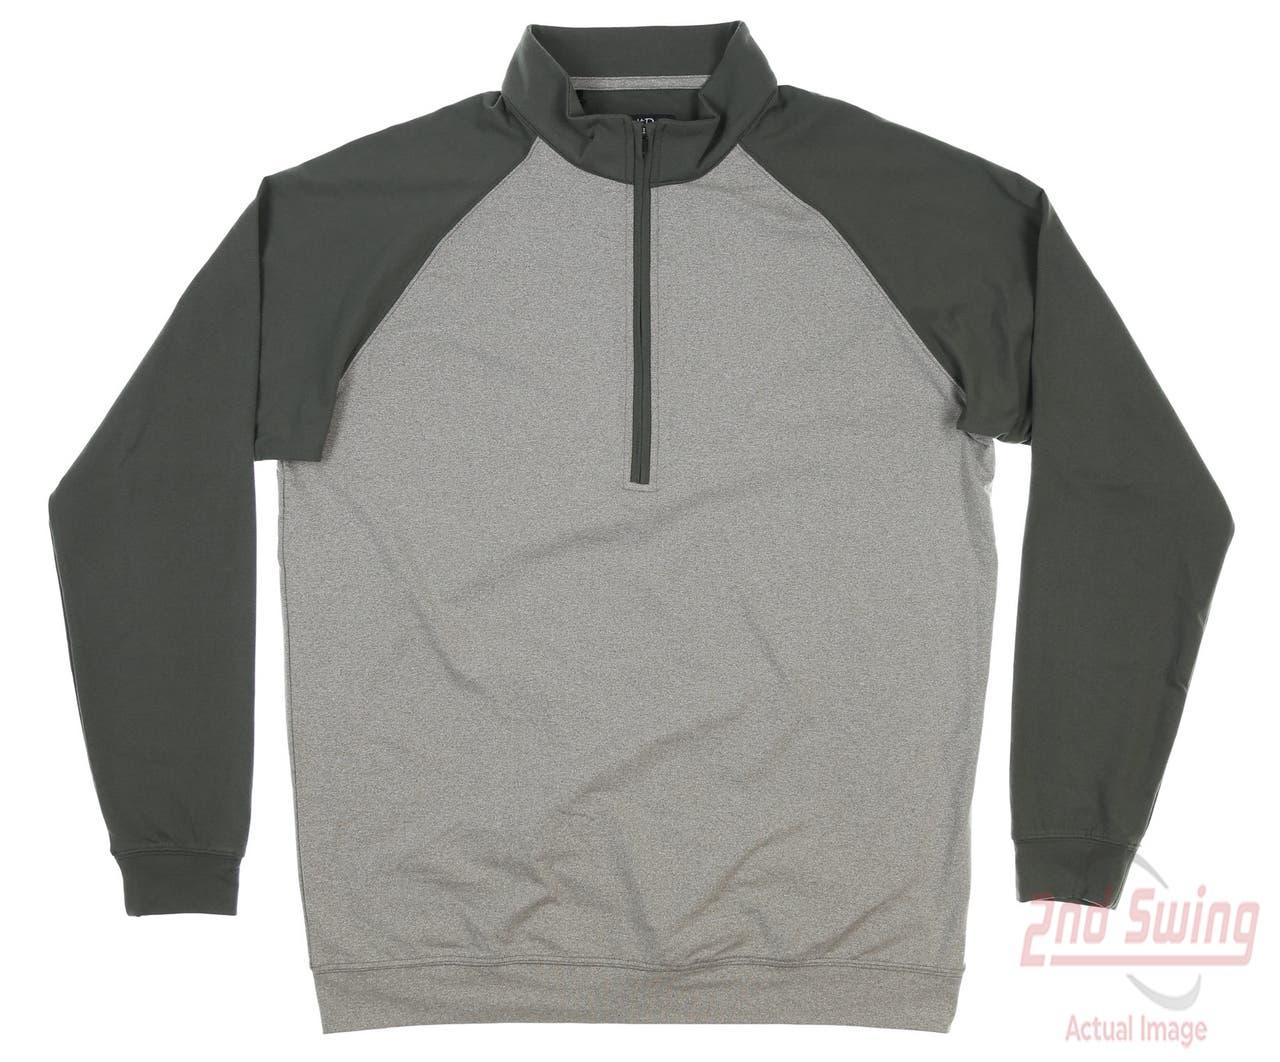 New Mens Straight Down 1/4 Zip Golf Pullover Medium M Olive MSRP $98 60475